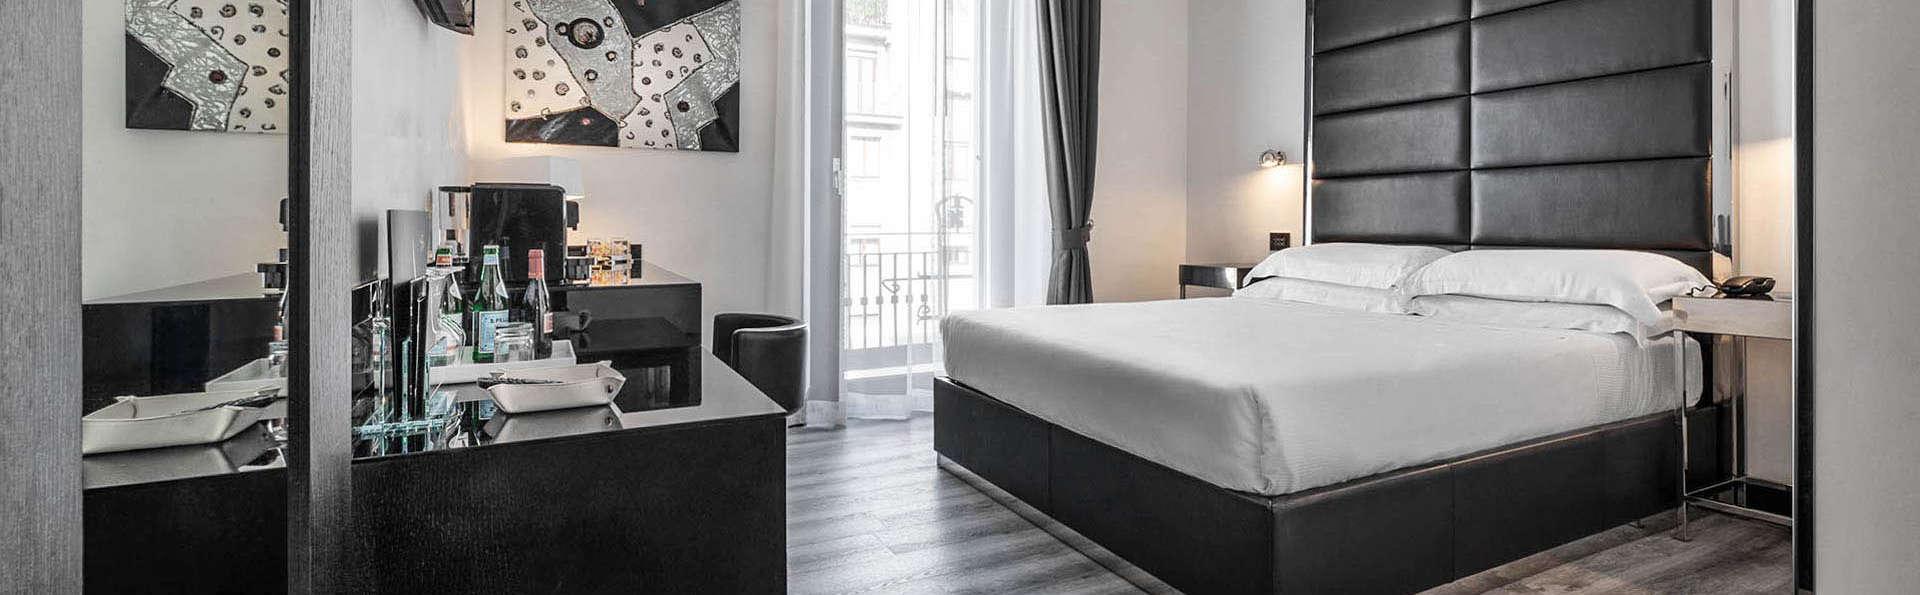 LHP Hotel Napoleon - EDIT_ROOM_03.jpg